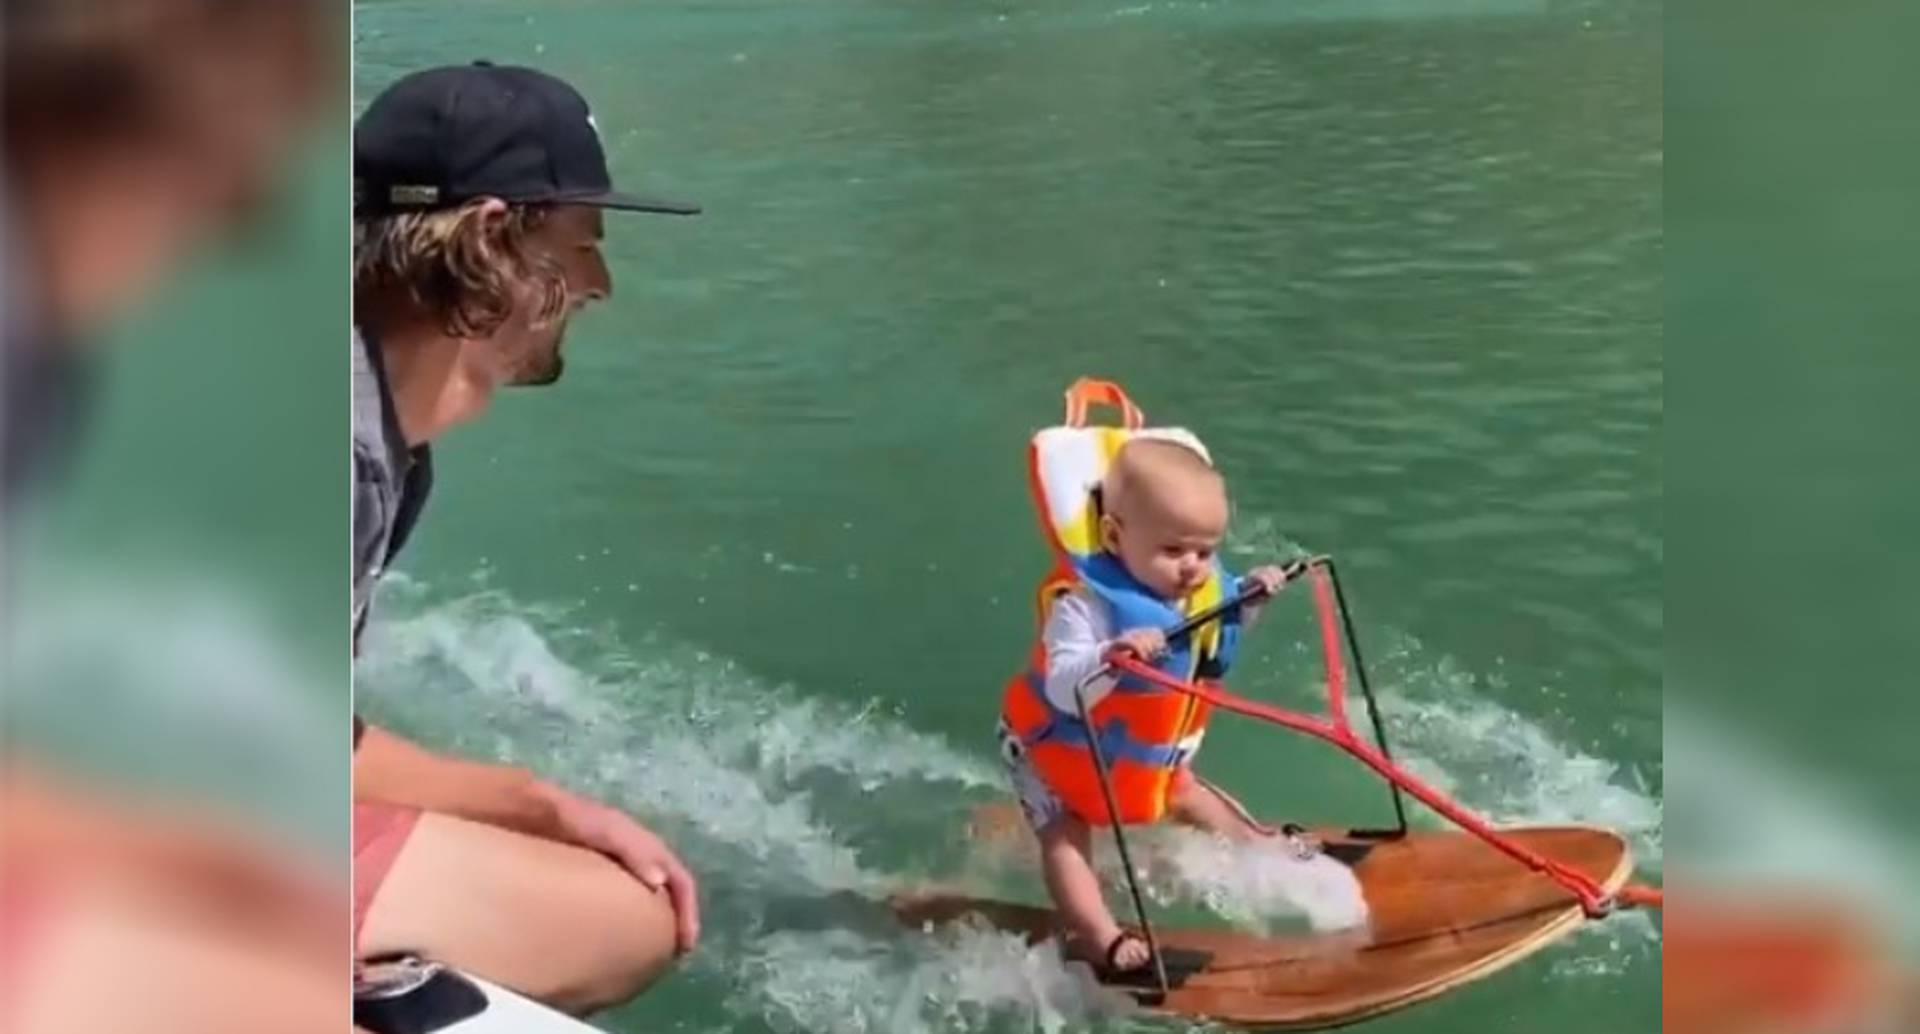 Bebé practicando esquí